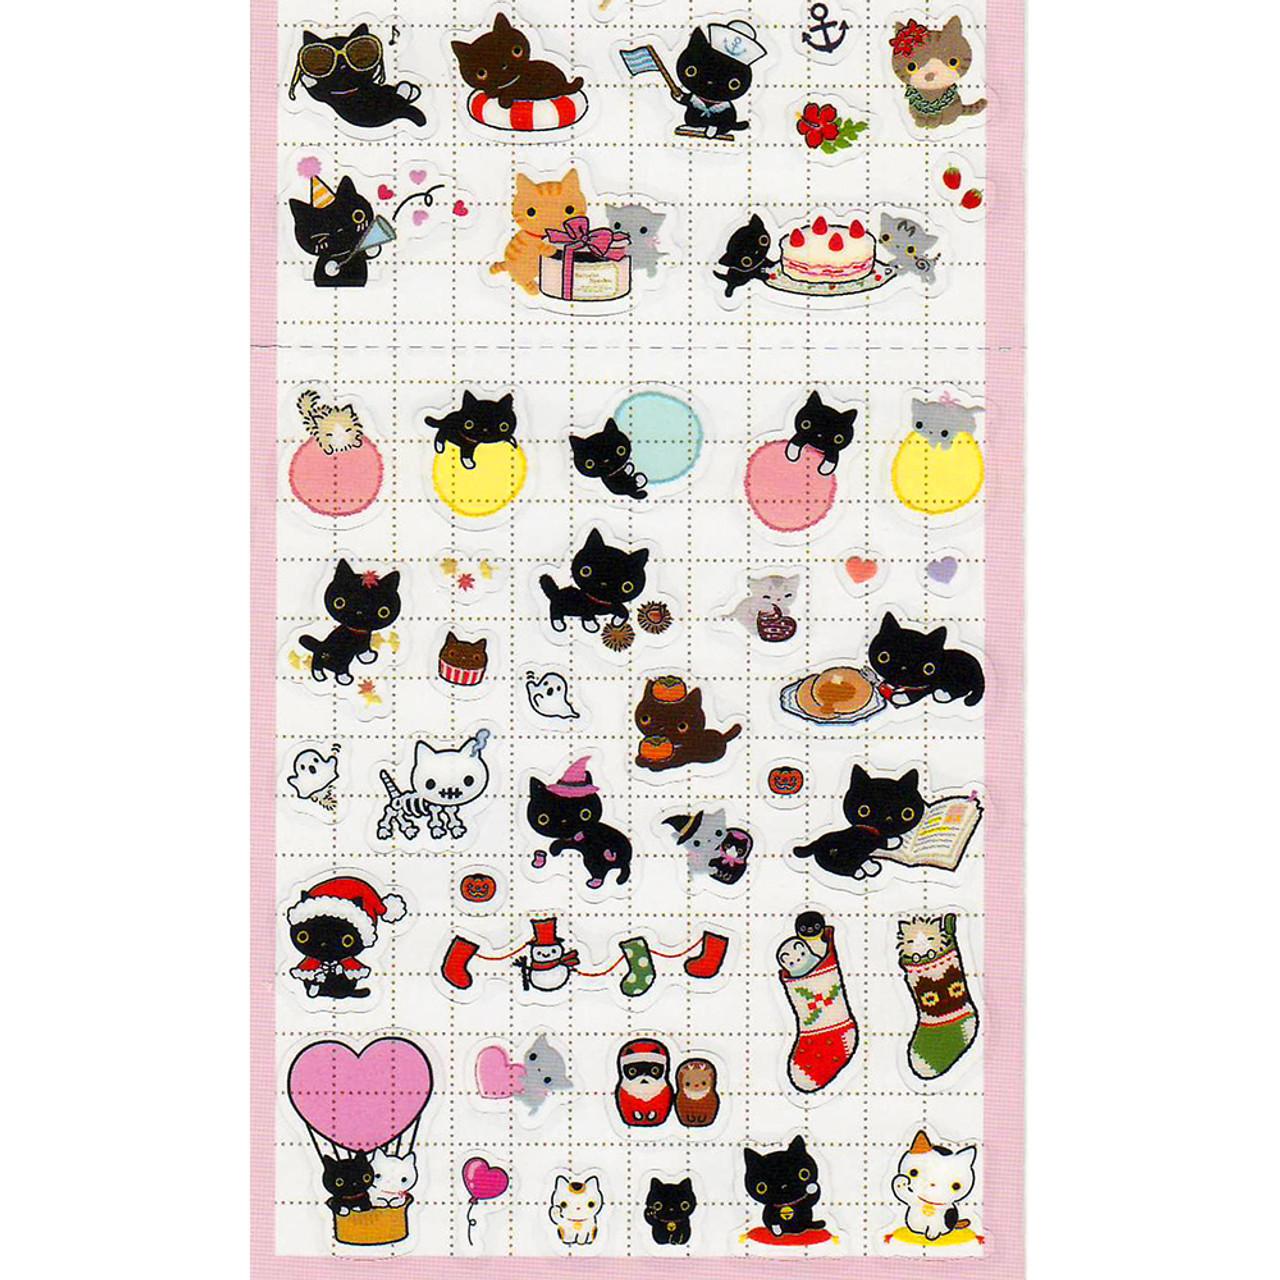 San-X Kutusita Nyanko Socks Black Cat Events Schedule Sticker SE30606 ( Close up Bottom )